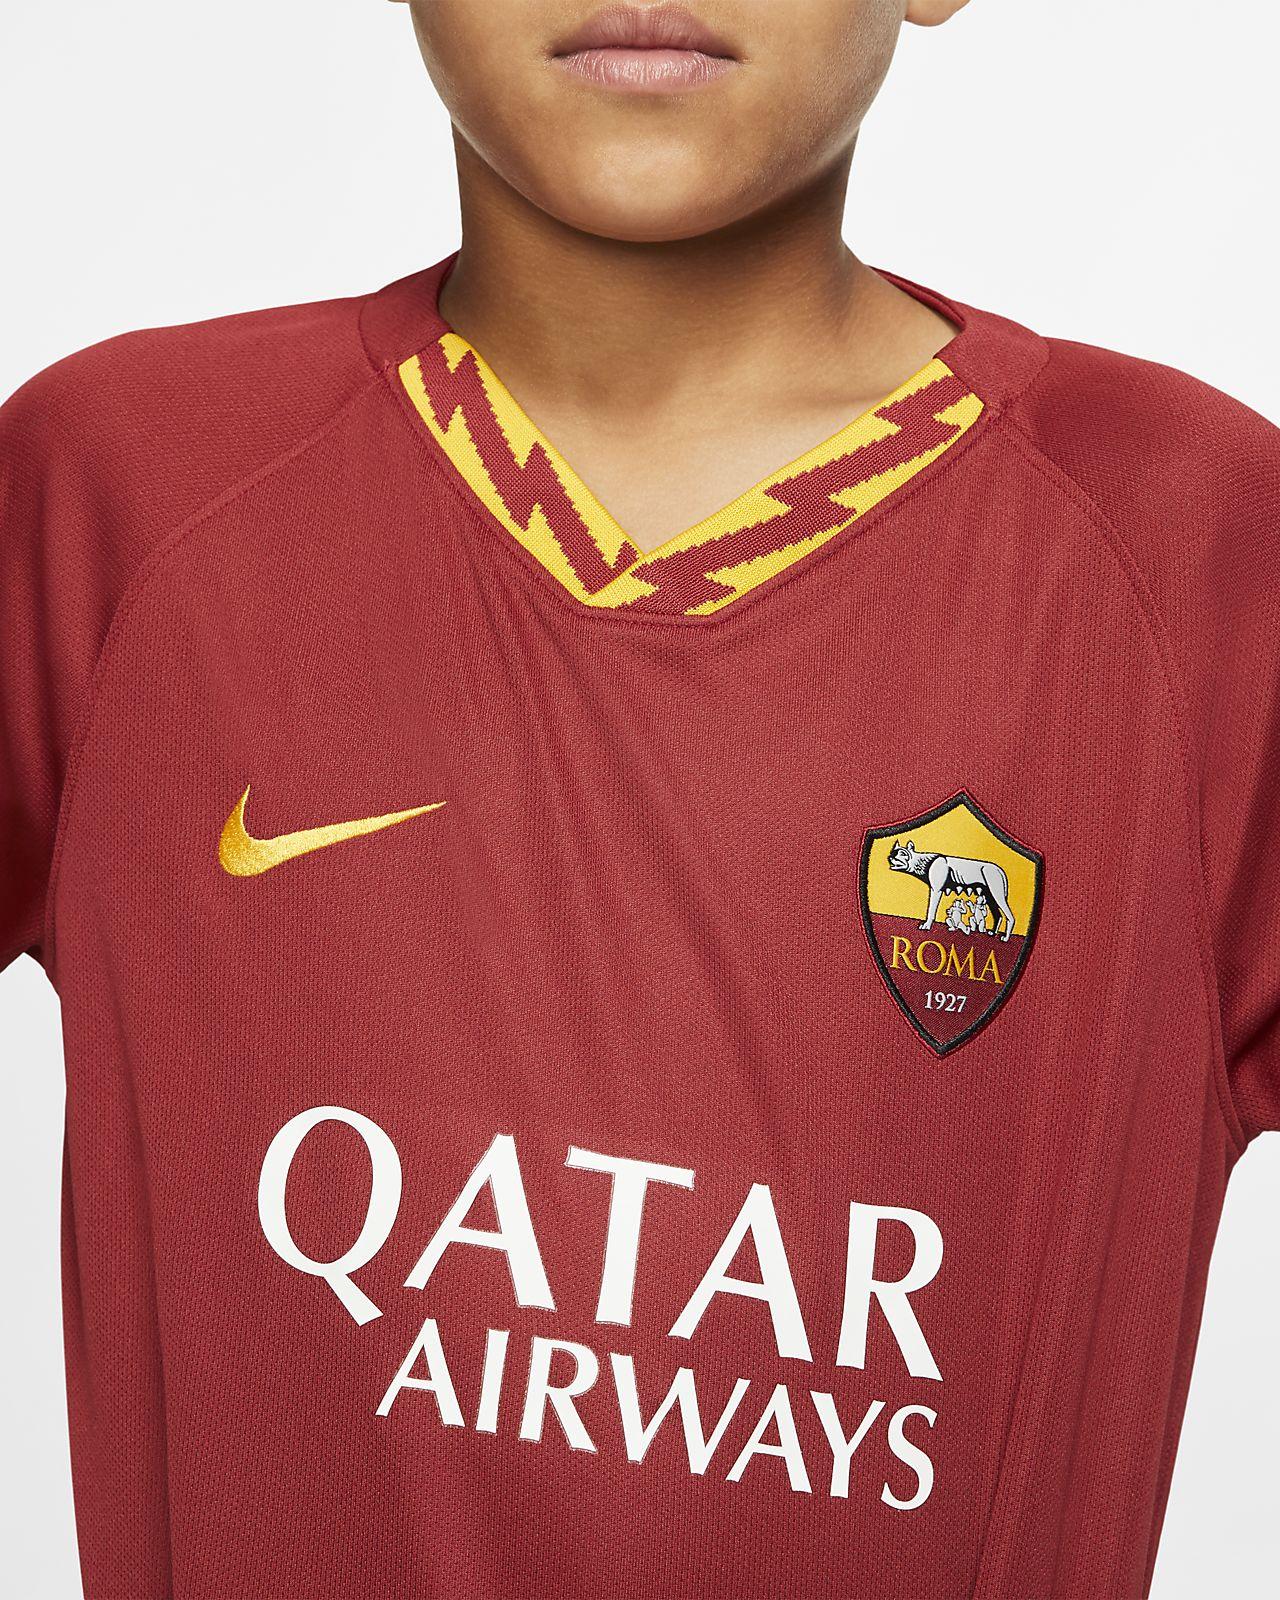 on sale 9c724 58254 A.S. Roma 2019/20 Stadium Home Older Kids' Football Shirt